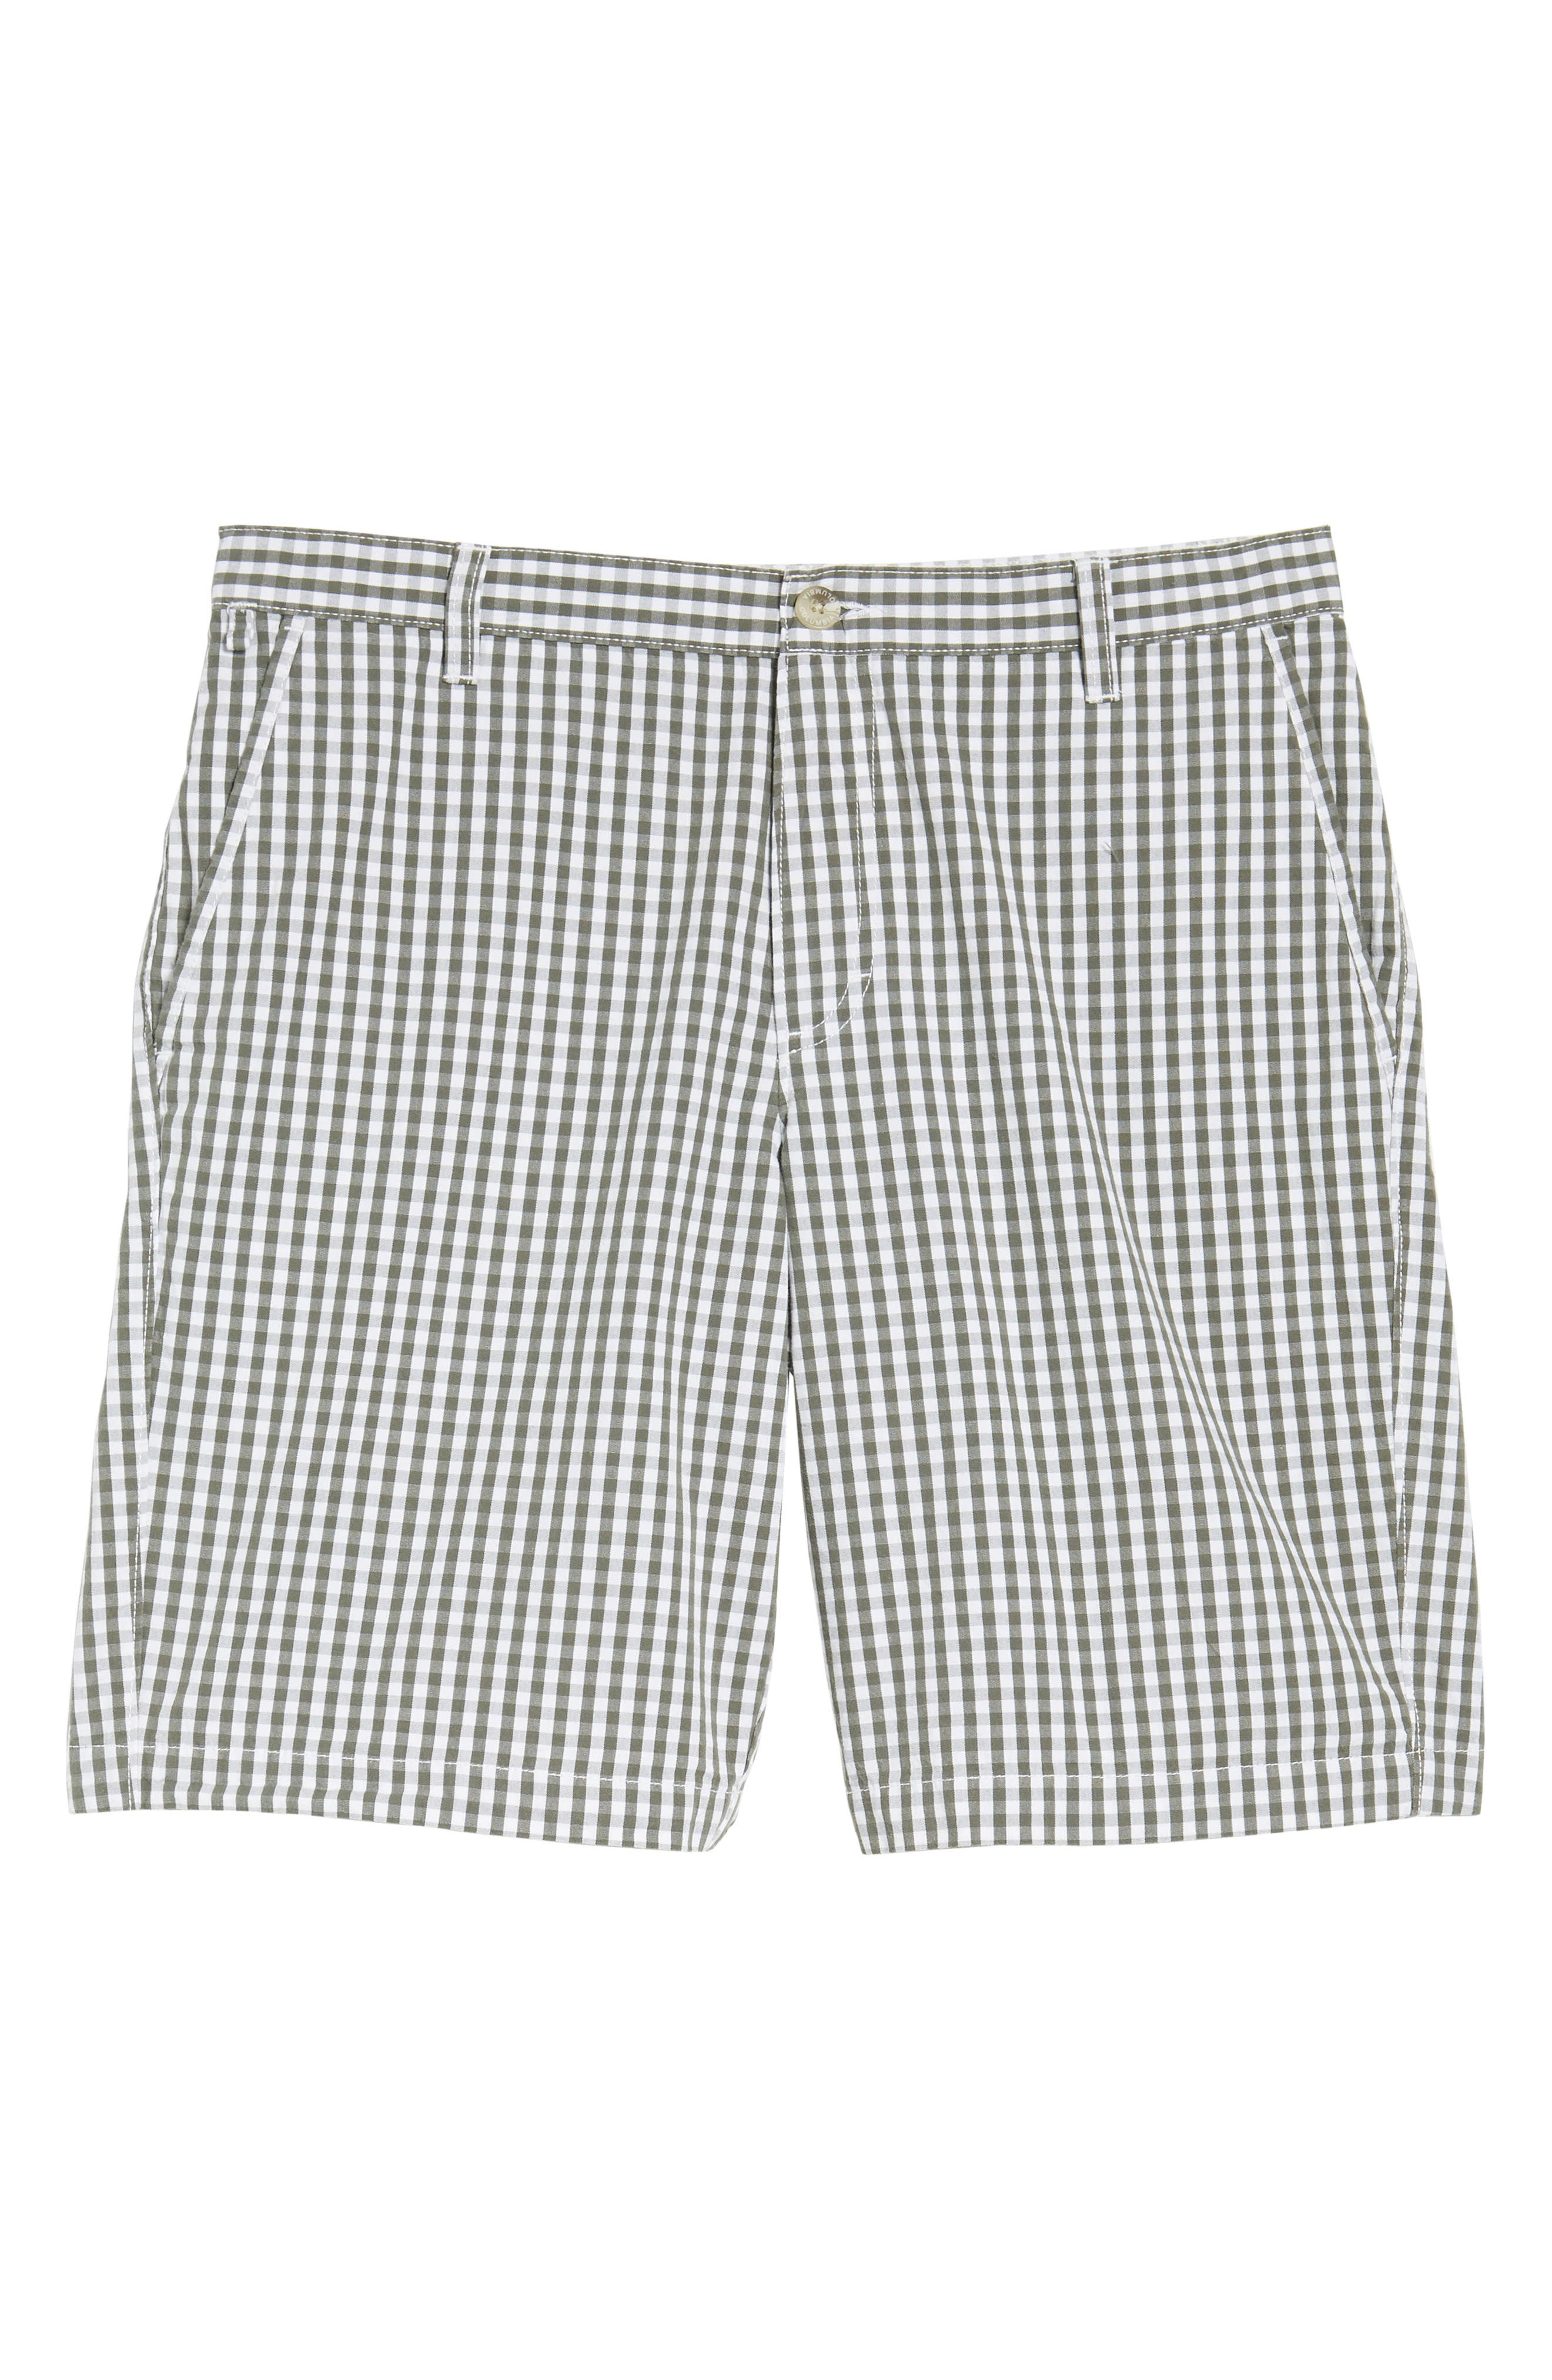 Super Bonehead II Shorts,                             Alternate thumbnail 6, color,                             317